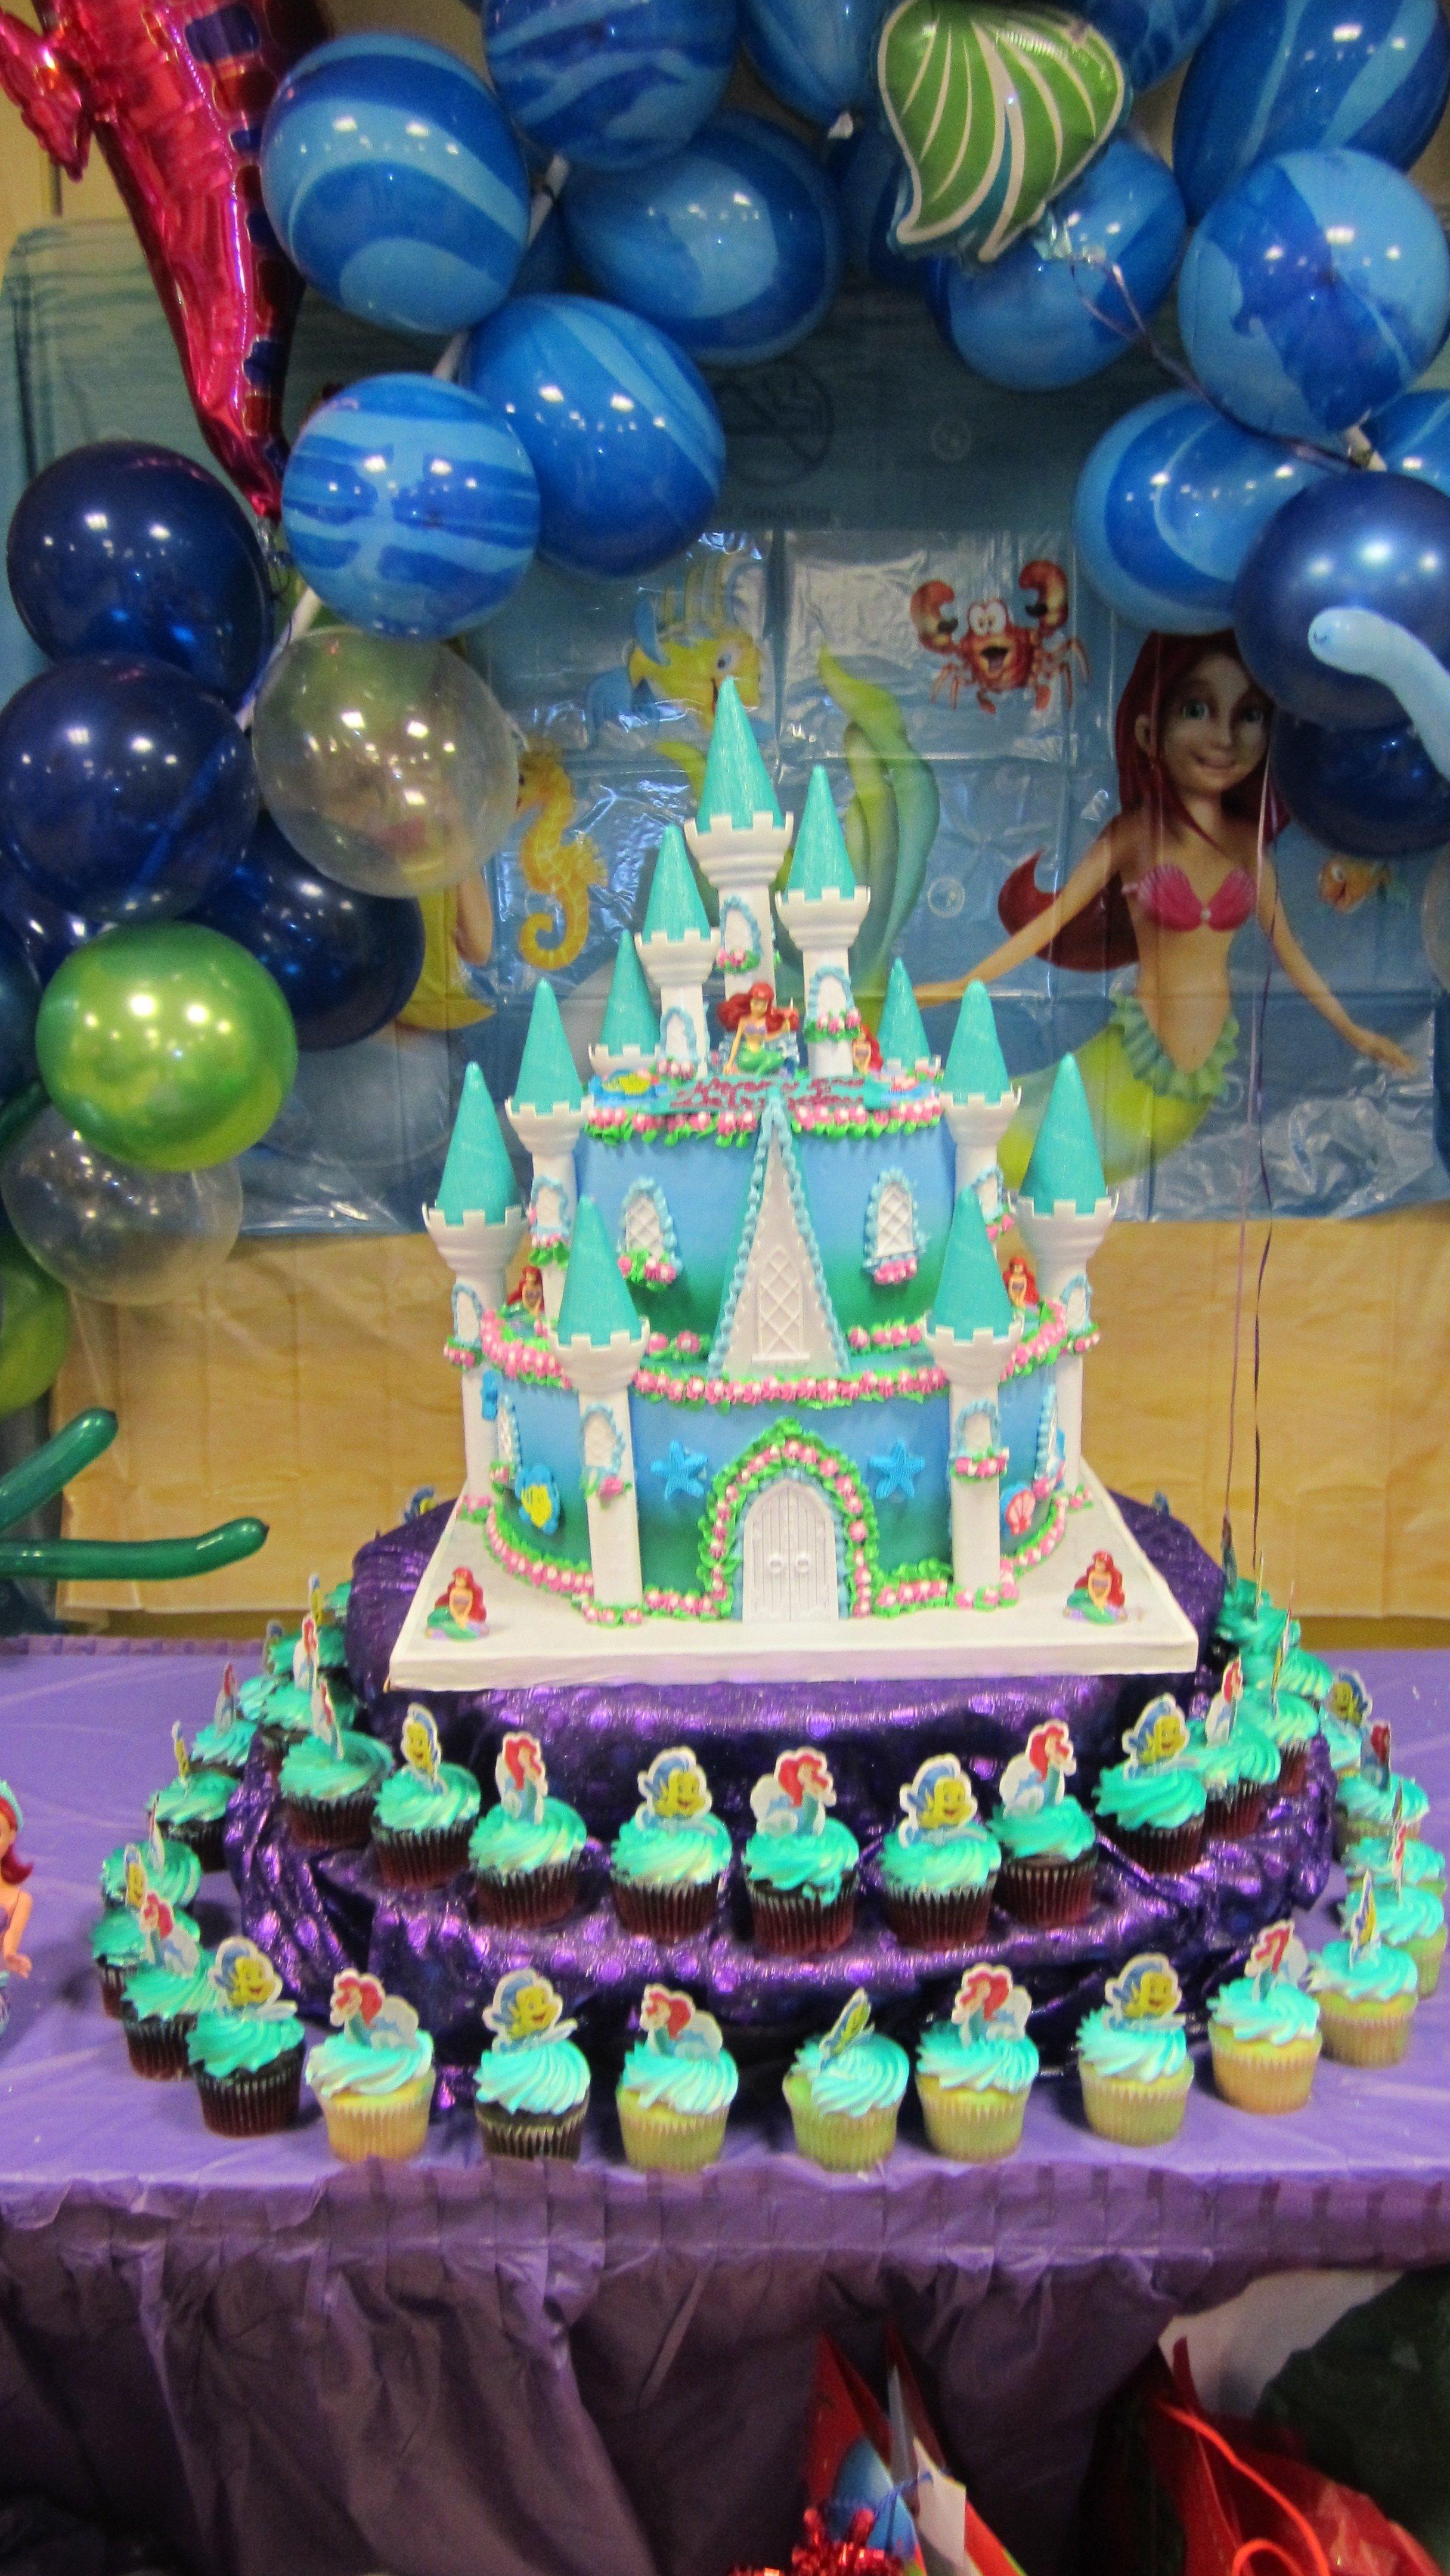 10 Pretty Little Mermaid Birthday Party Ideas little mermaid birthday cake party decorations pinterest 1 2021